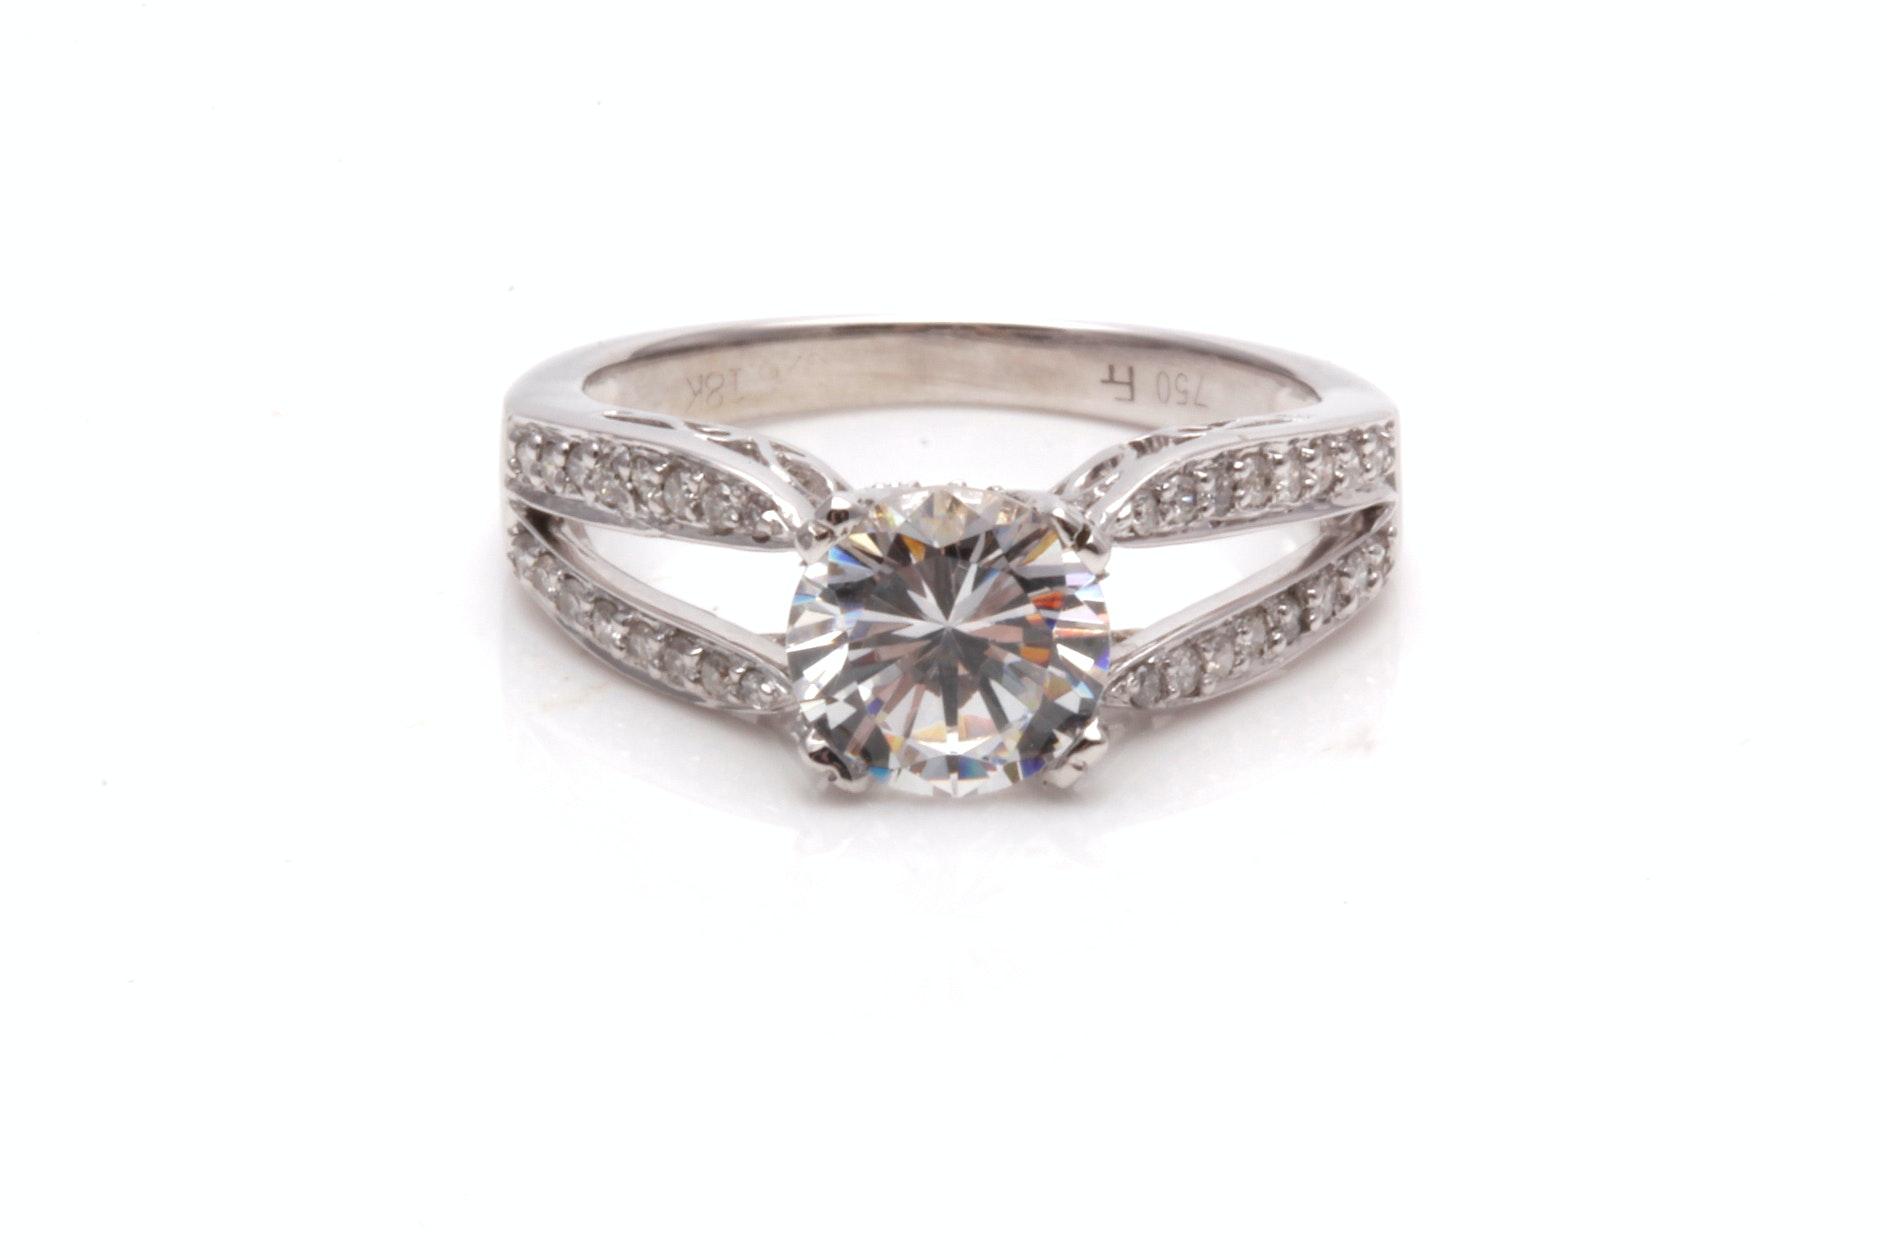 18K White Gold Semi Mount Diamond Ring With Cubic Zirconia Center Stone